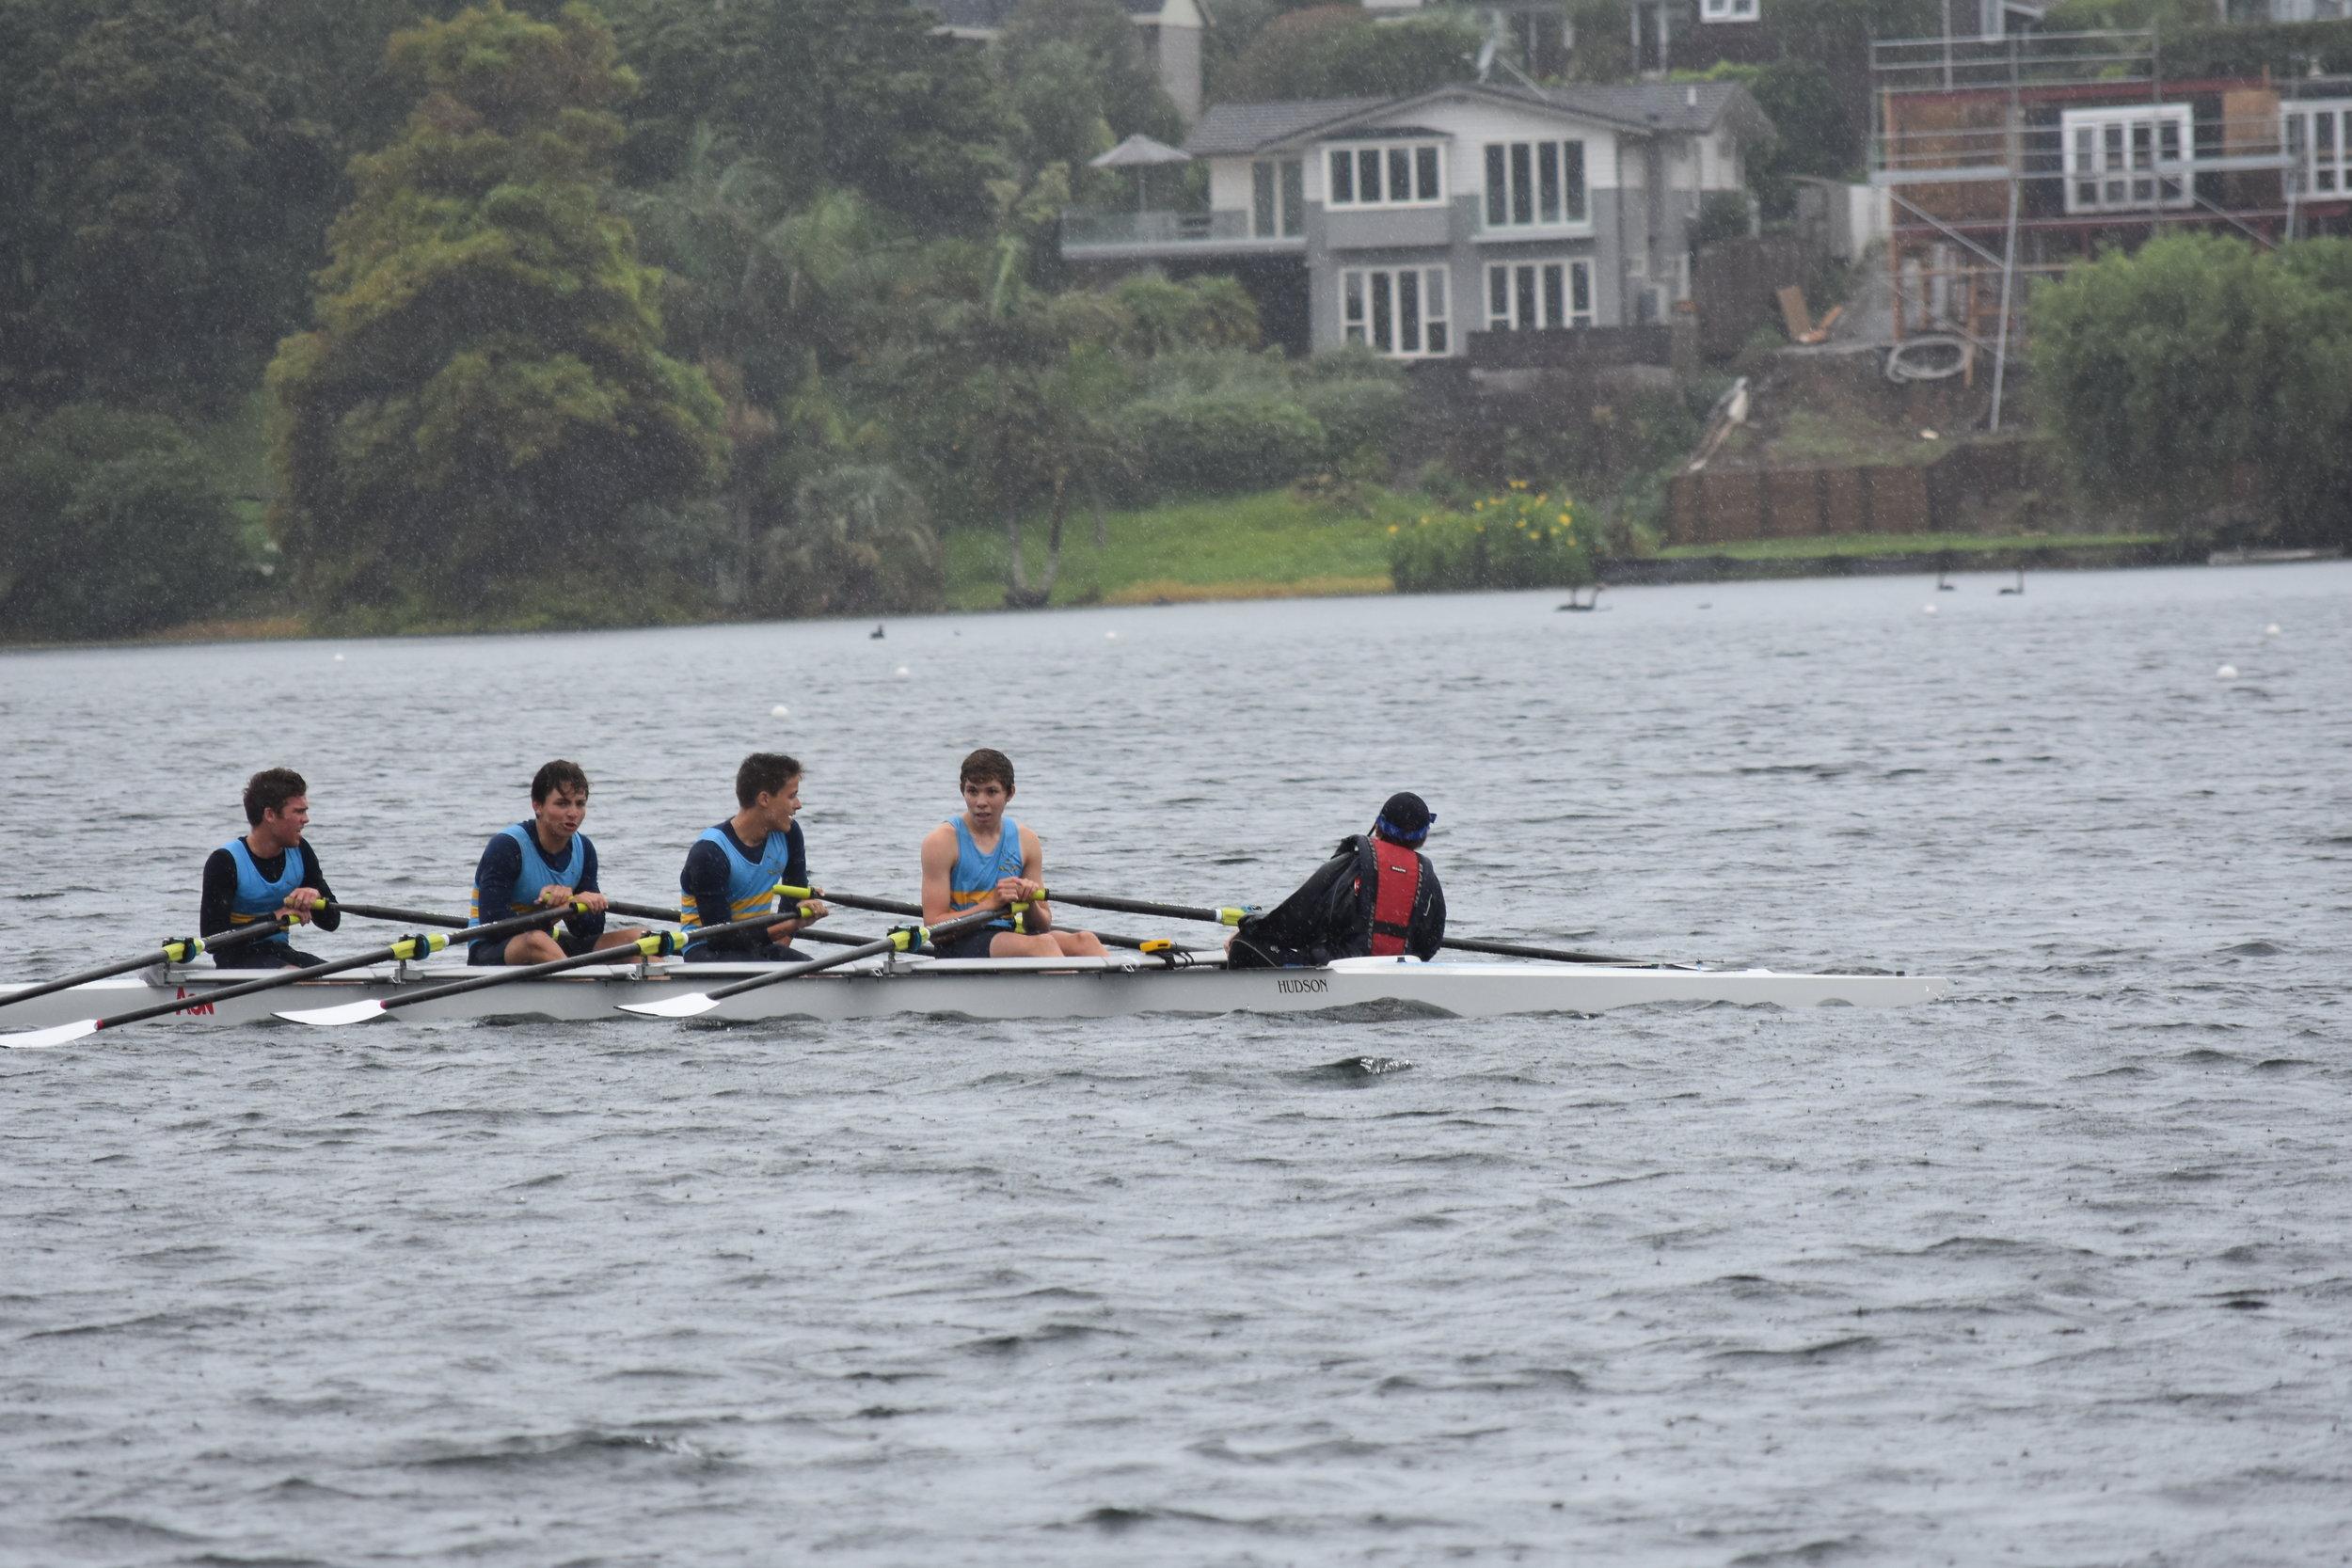 BU15 X+ 1st! Anthony, Callum, Ethan and Blake